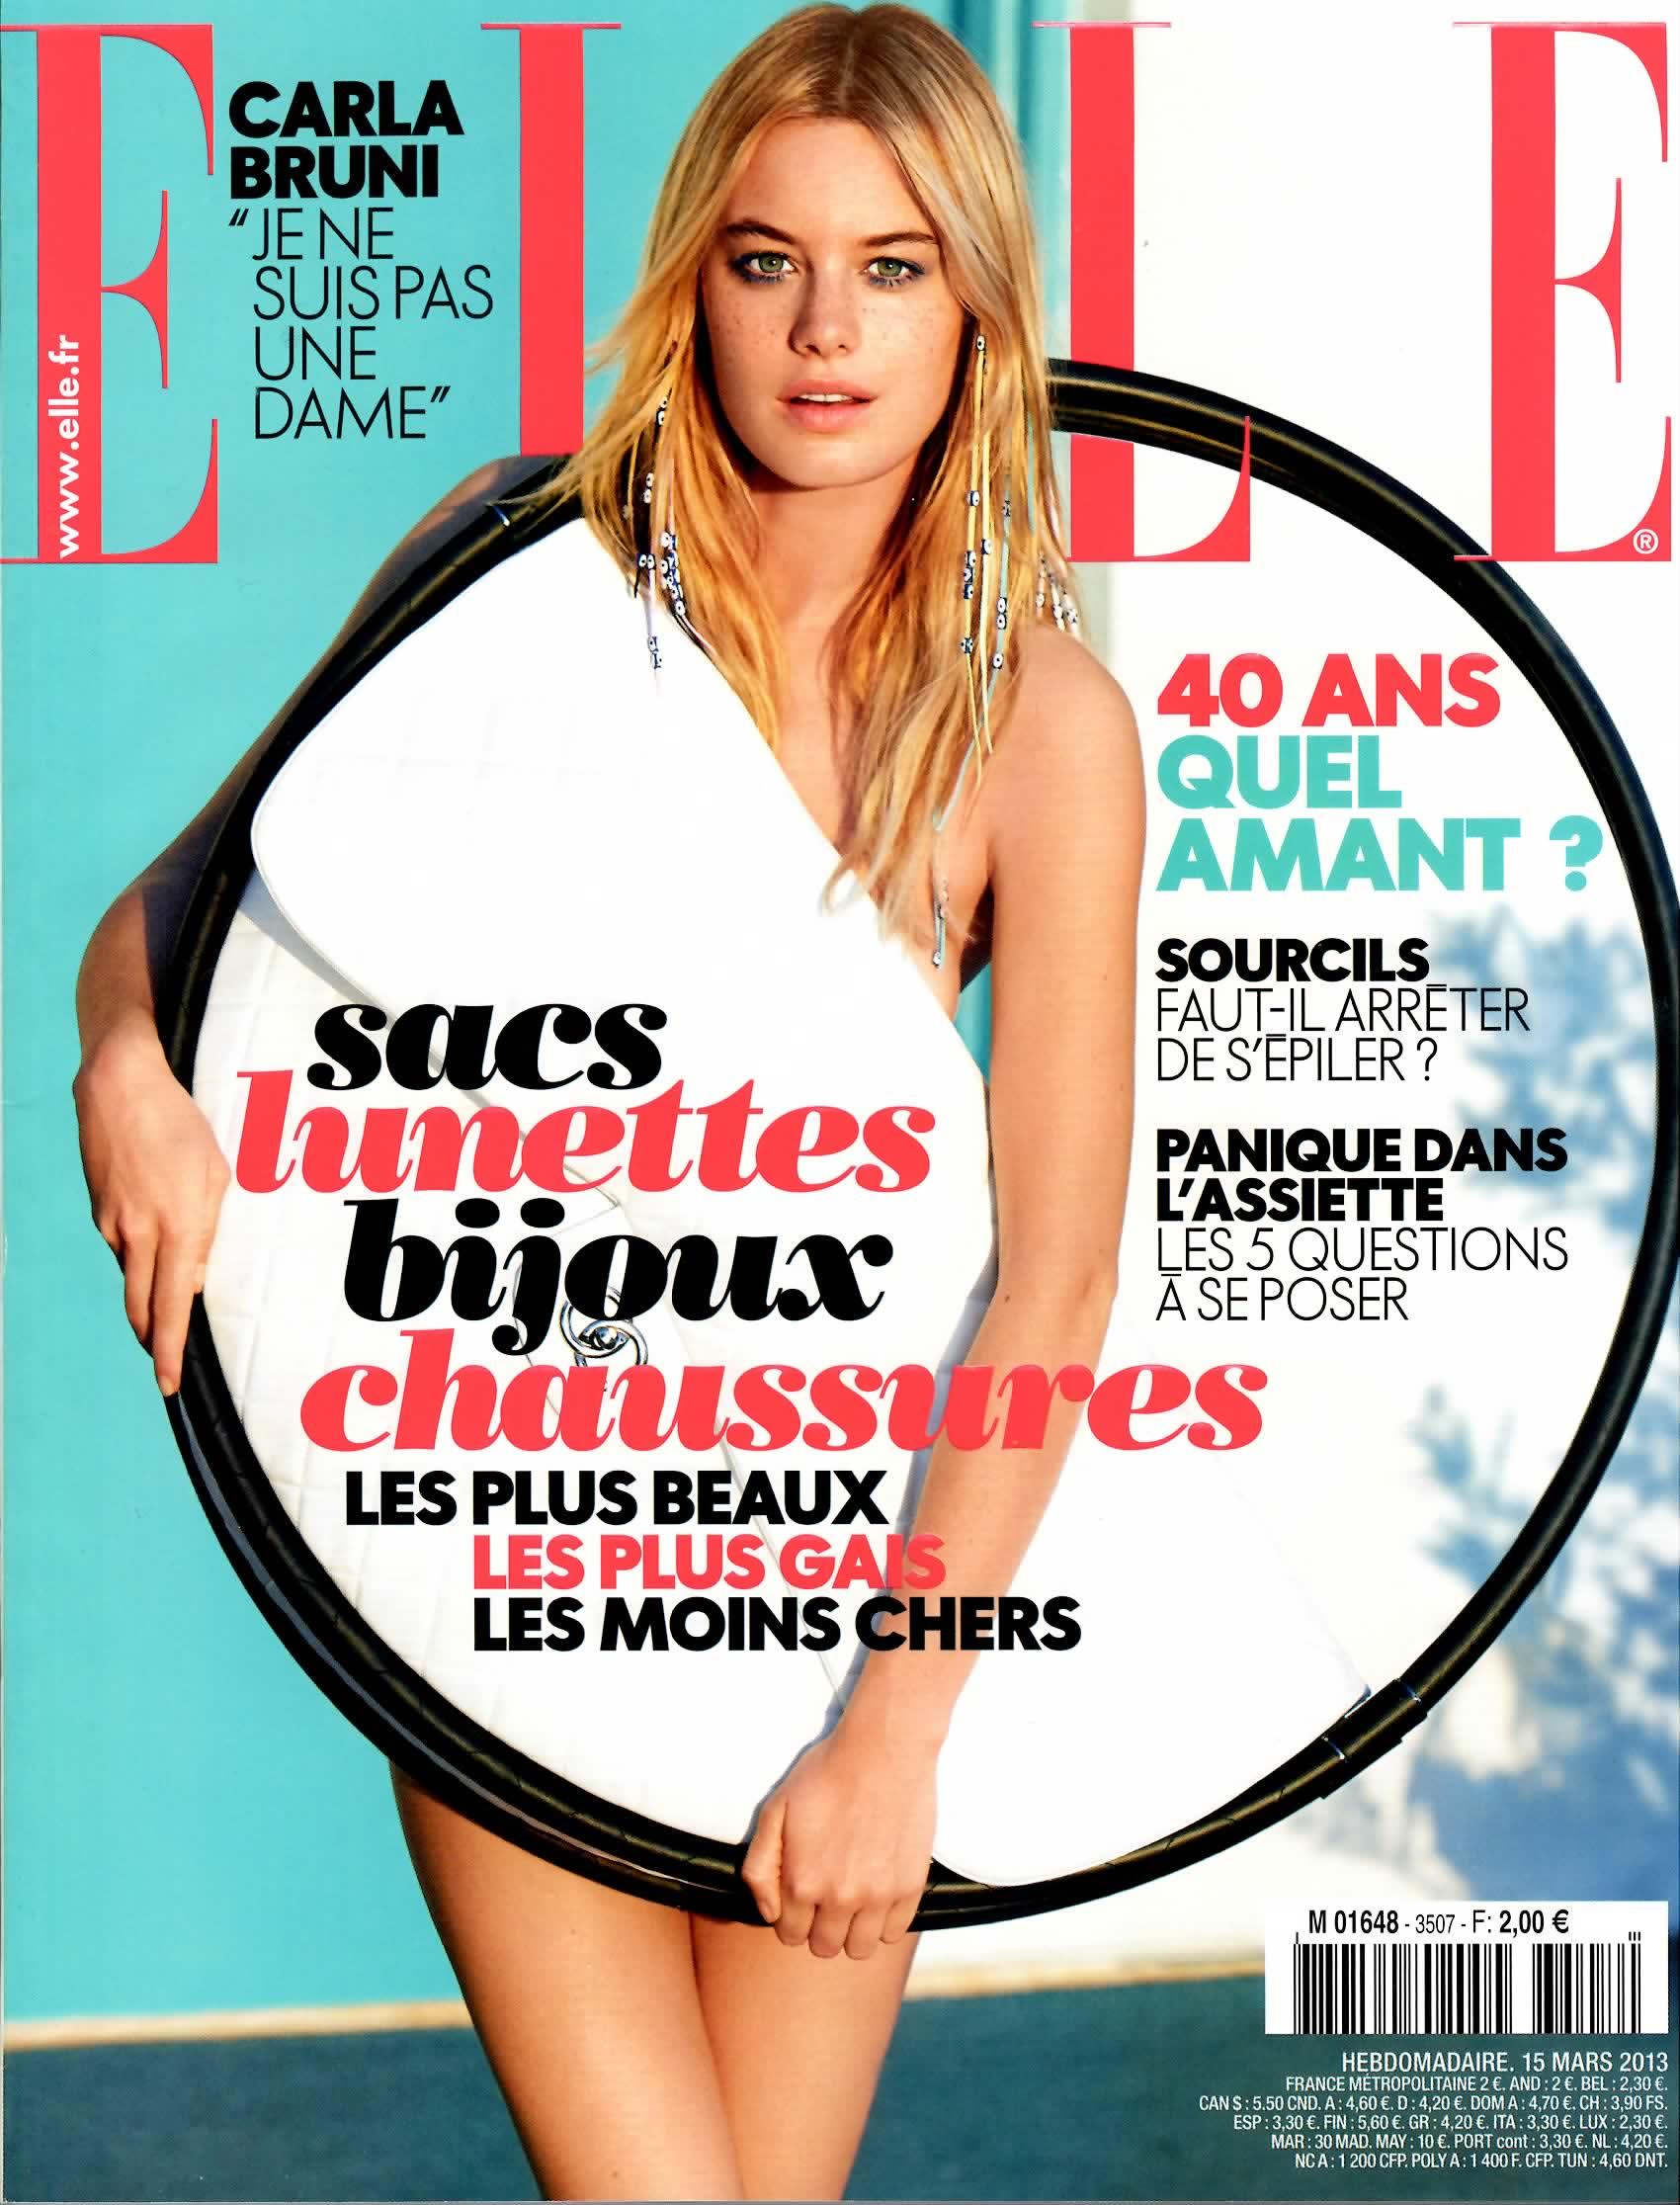 ELLE FRANCE - MARCH 2013